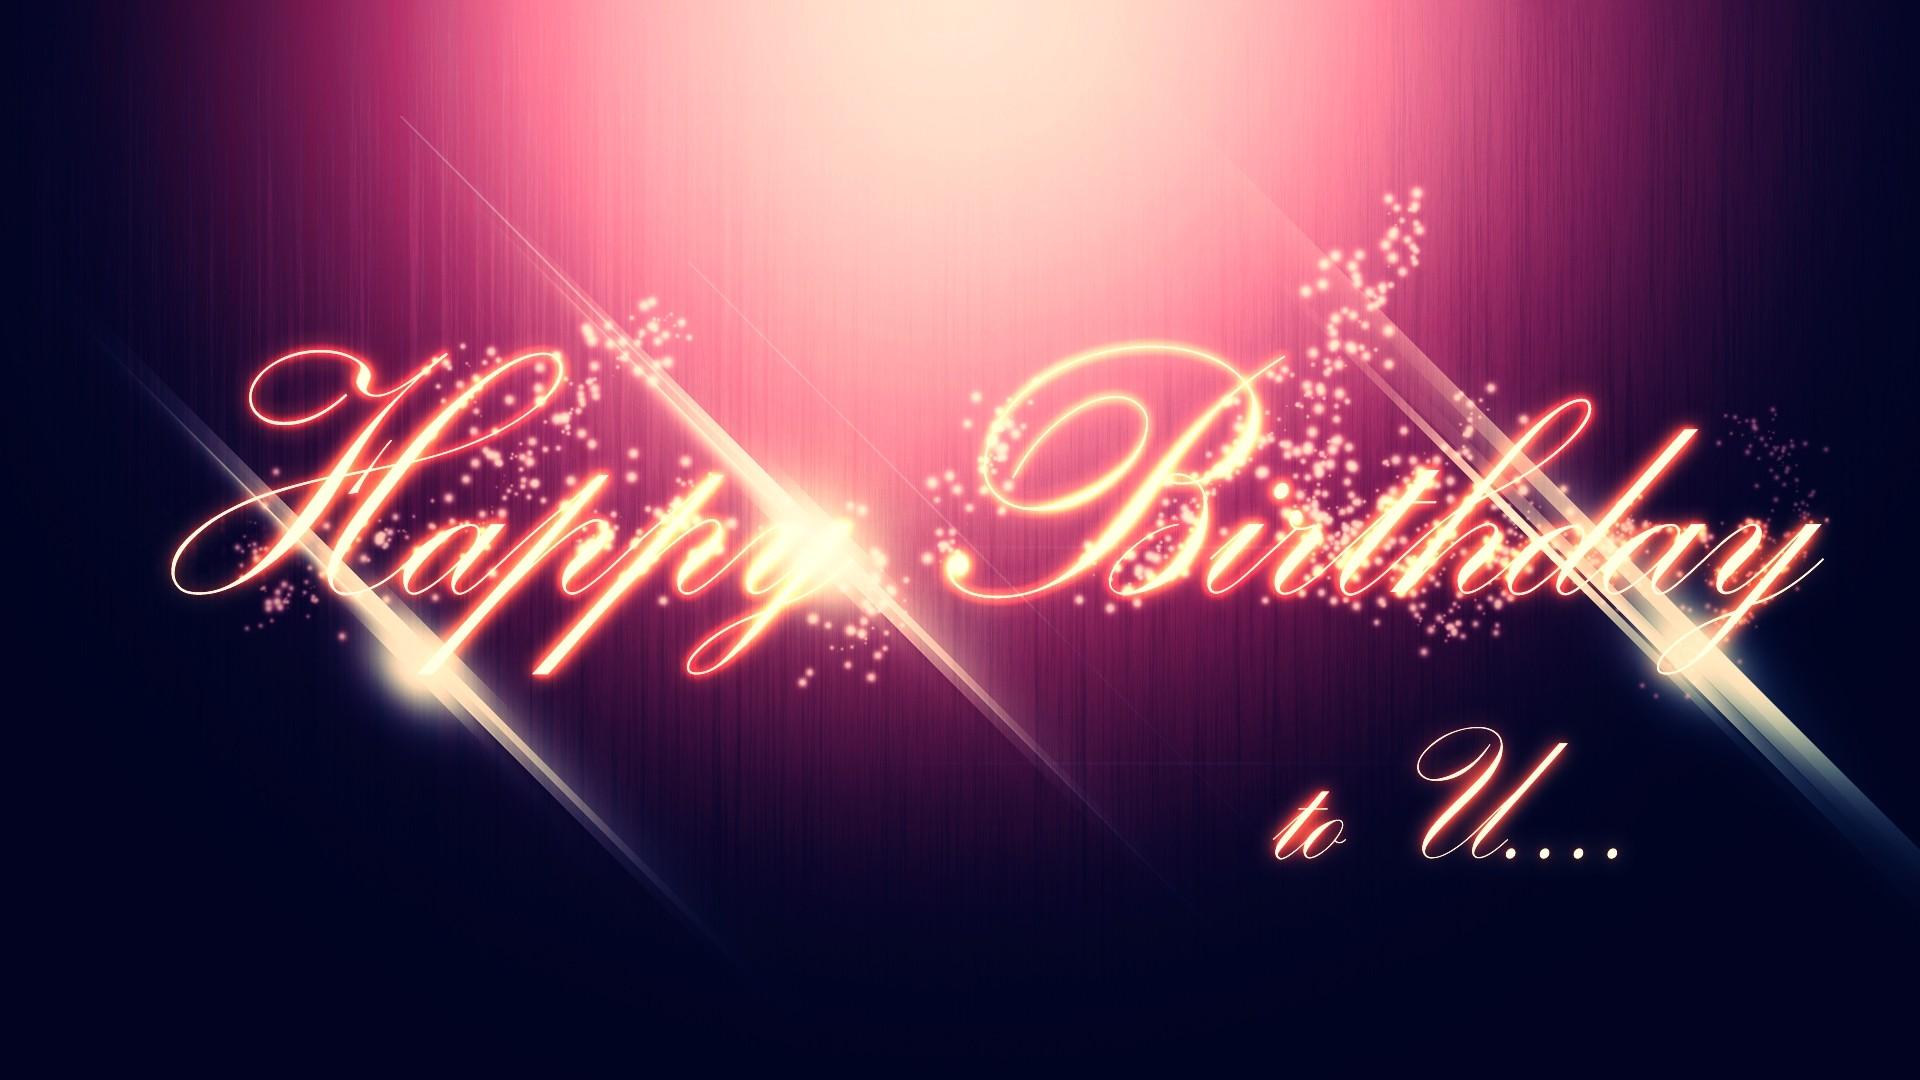 Happy Birthday Live Wallpapers Happy Birthday Wallpaper Animated Happy Birthday Images Hd 1920x1080 Wallpaper Teahub Io